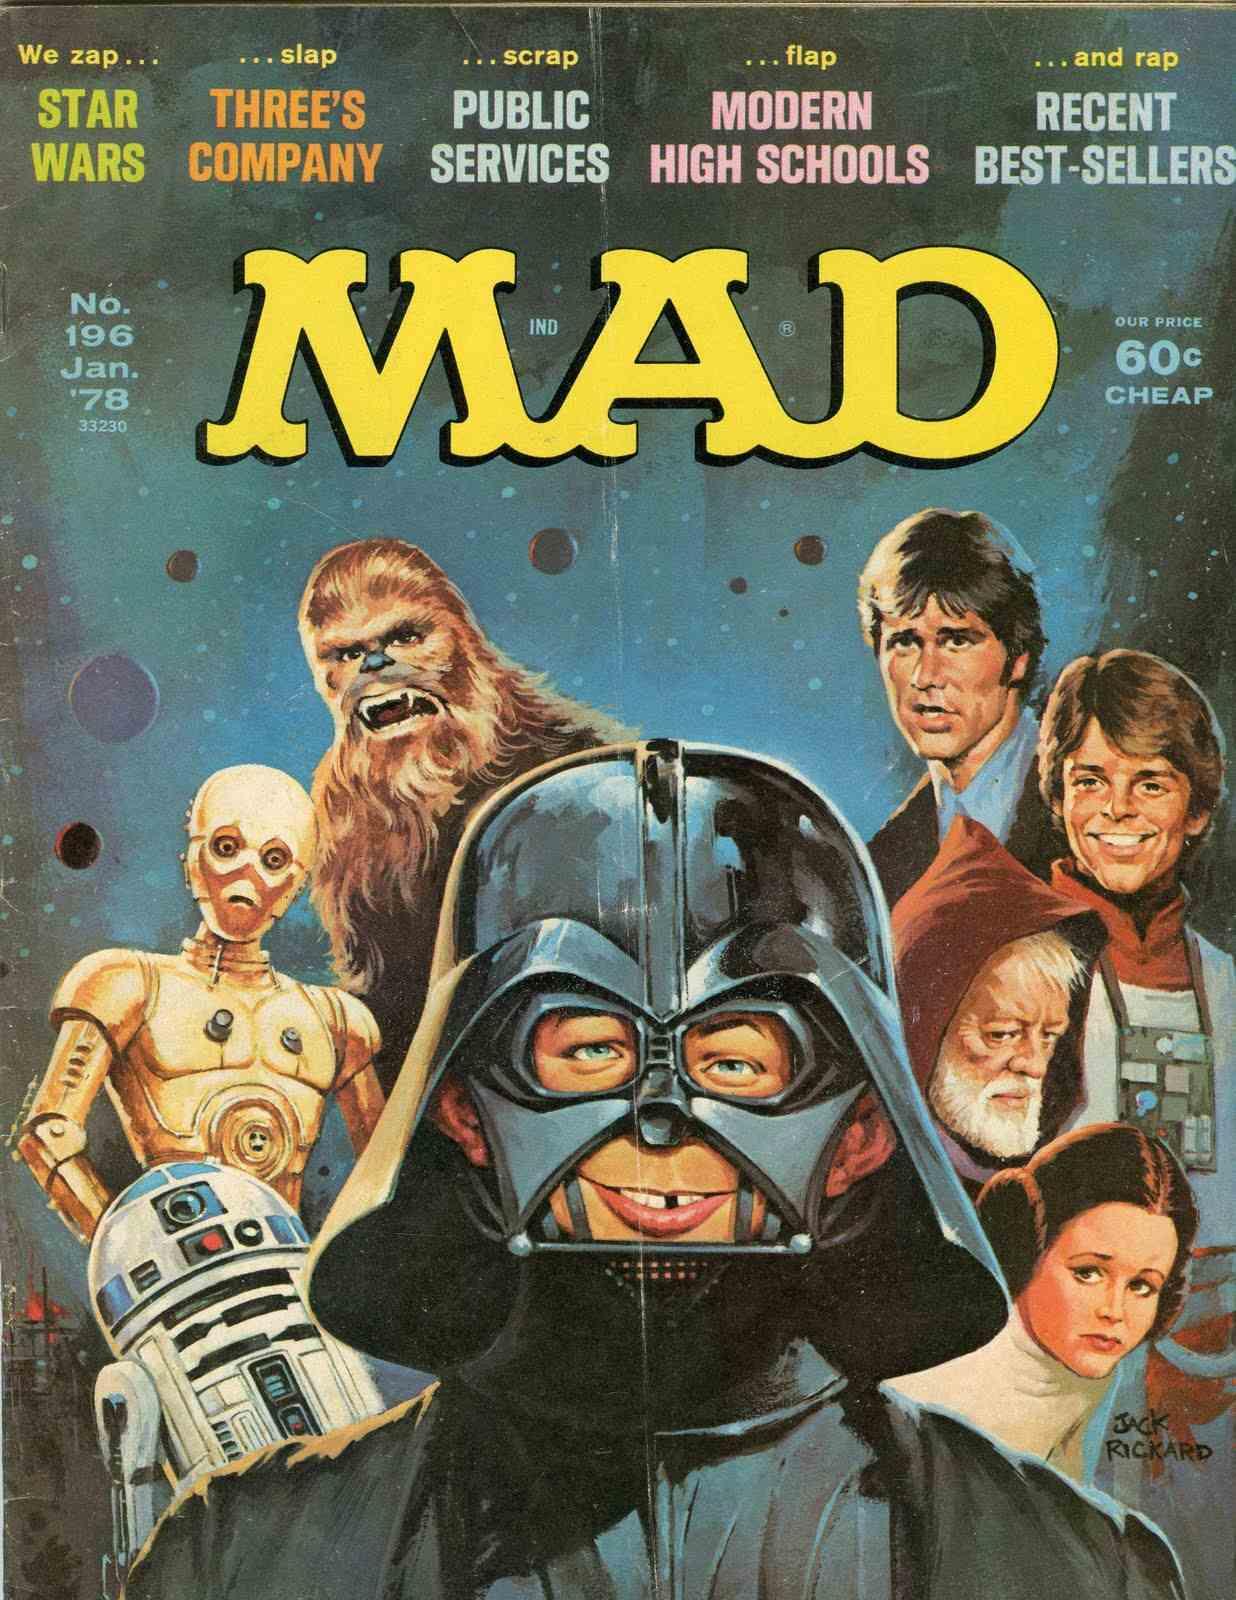 'Star Wars: A New Hope', January 1978 by Jack Rickard.